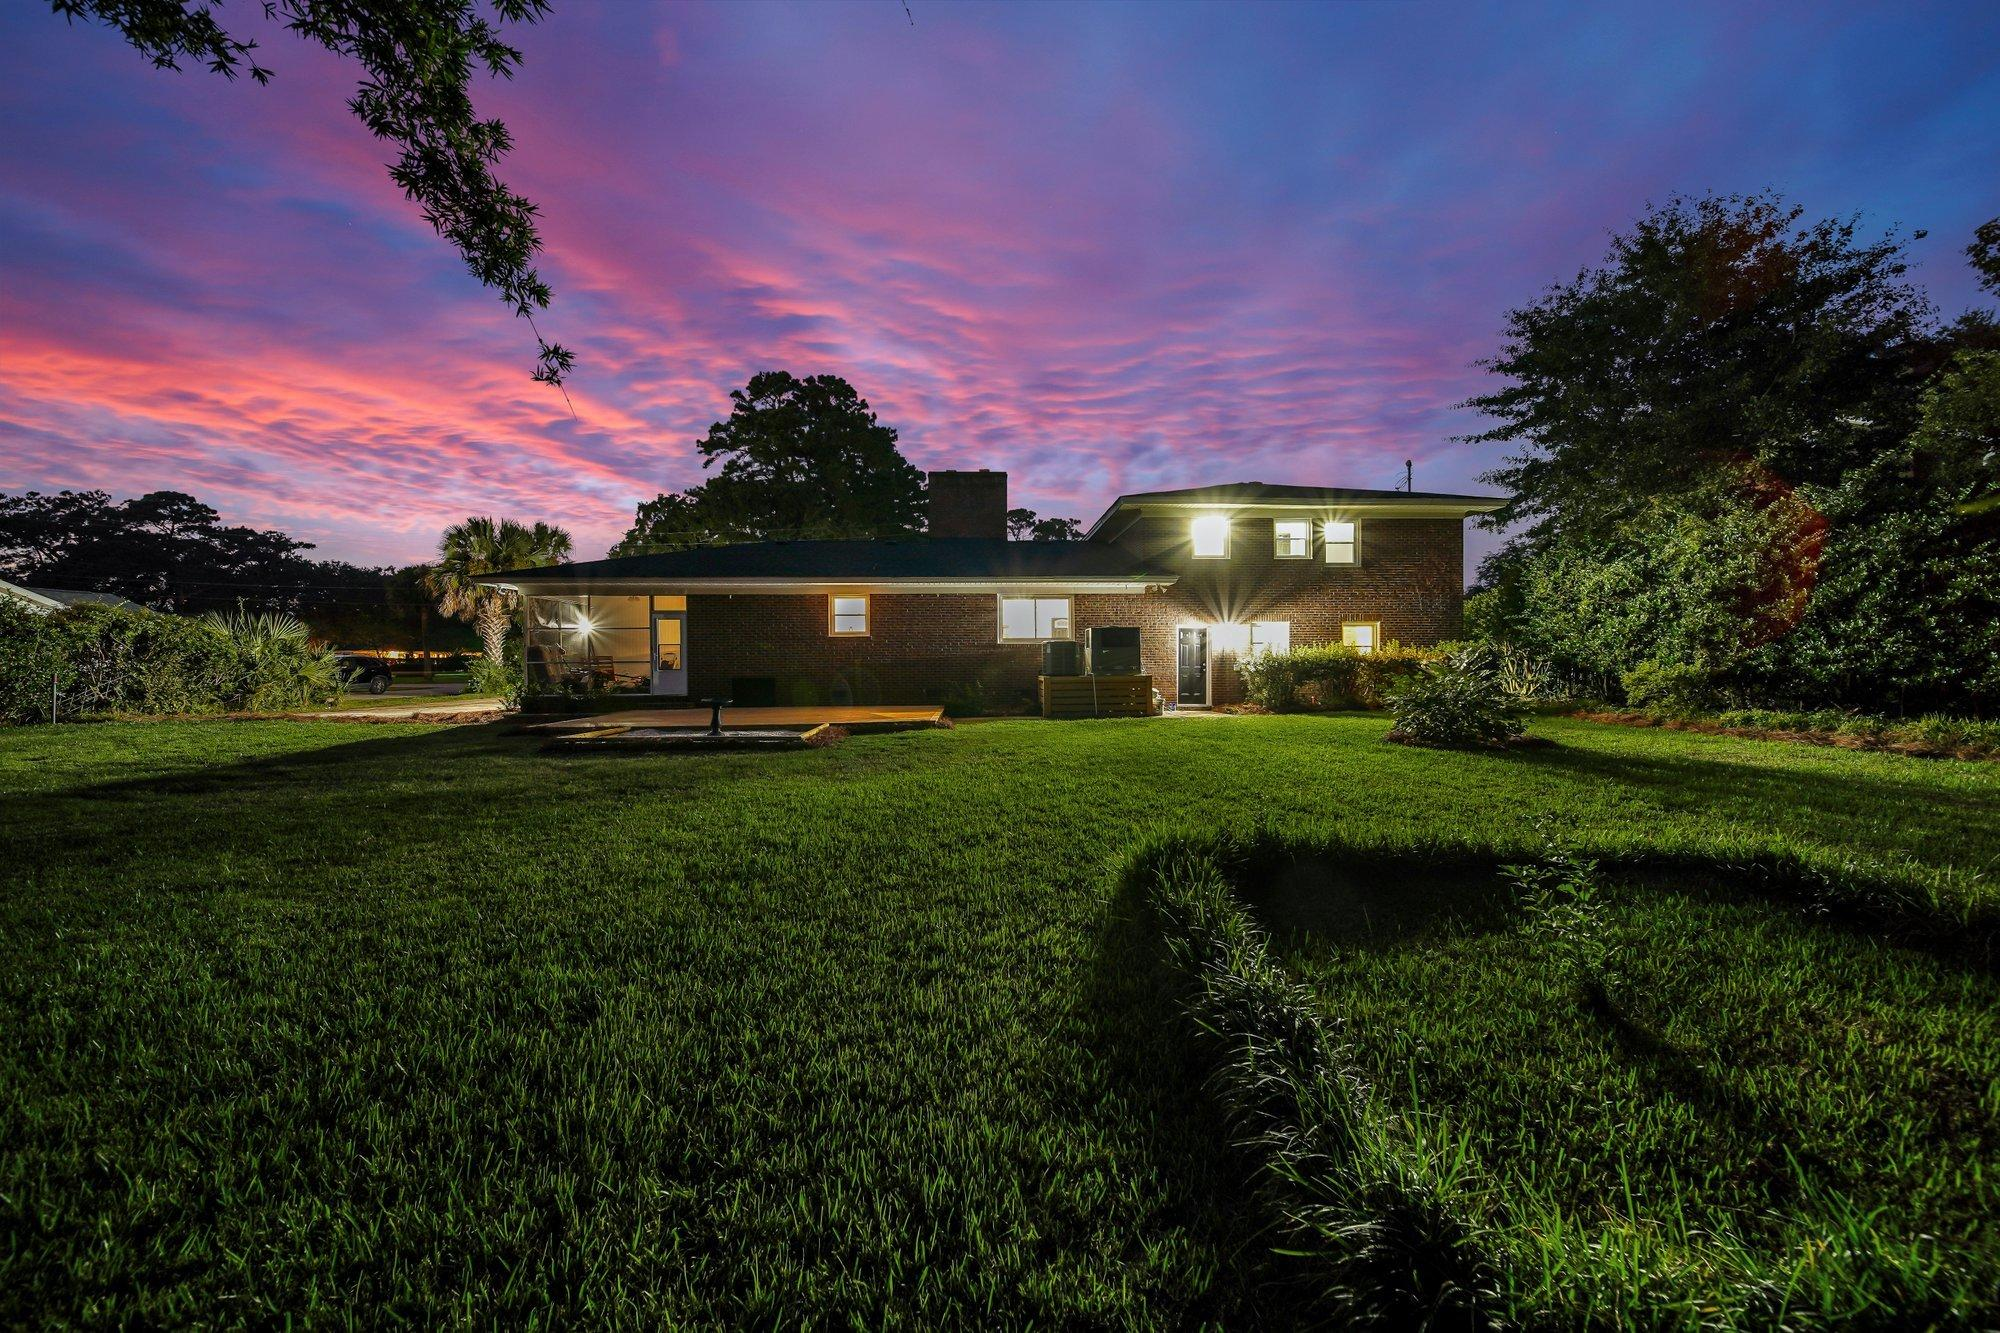 Country Club II Homes For Sale - 1477 Burningtree, Charleston, SC - 20